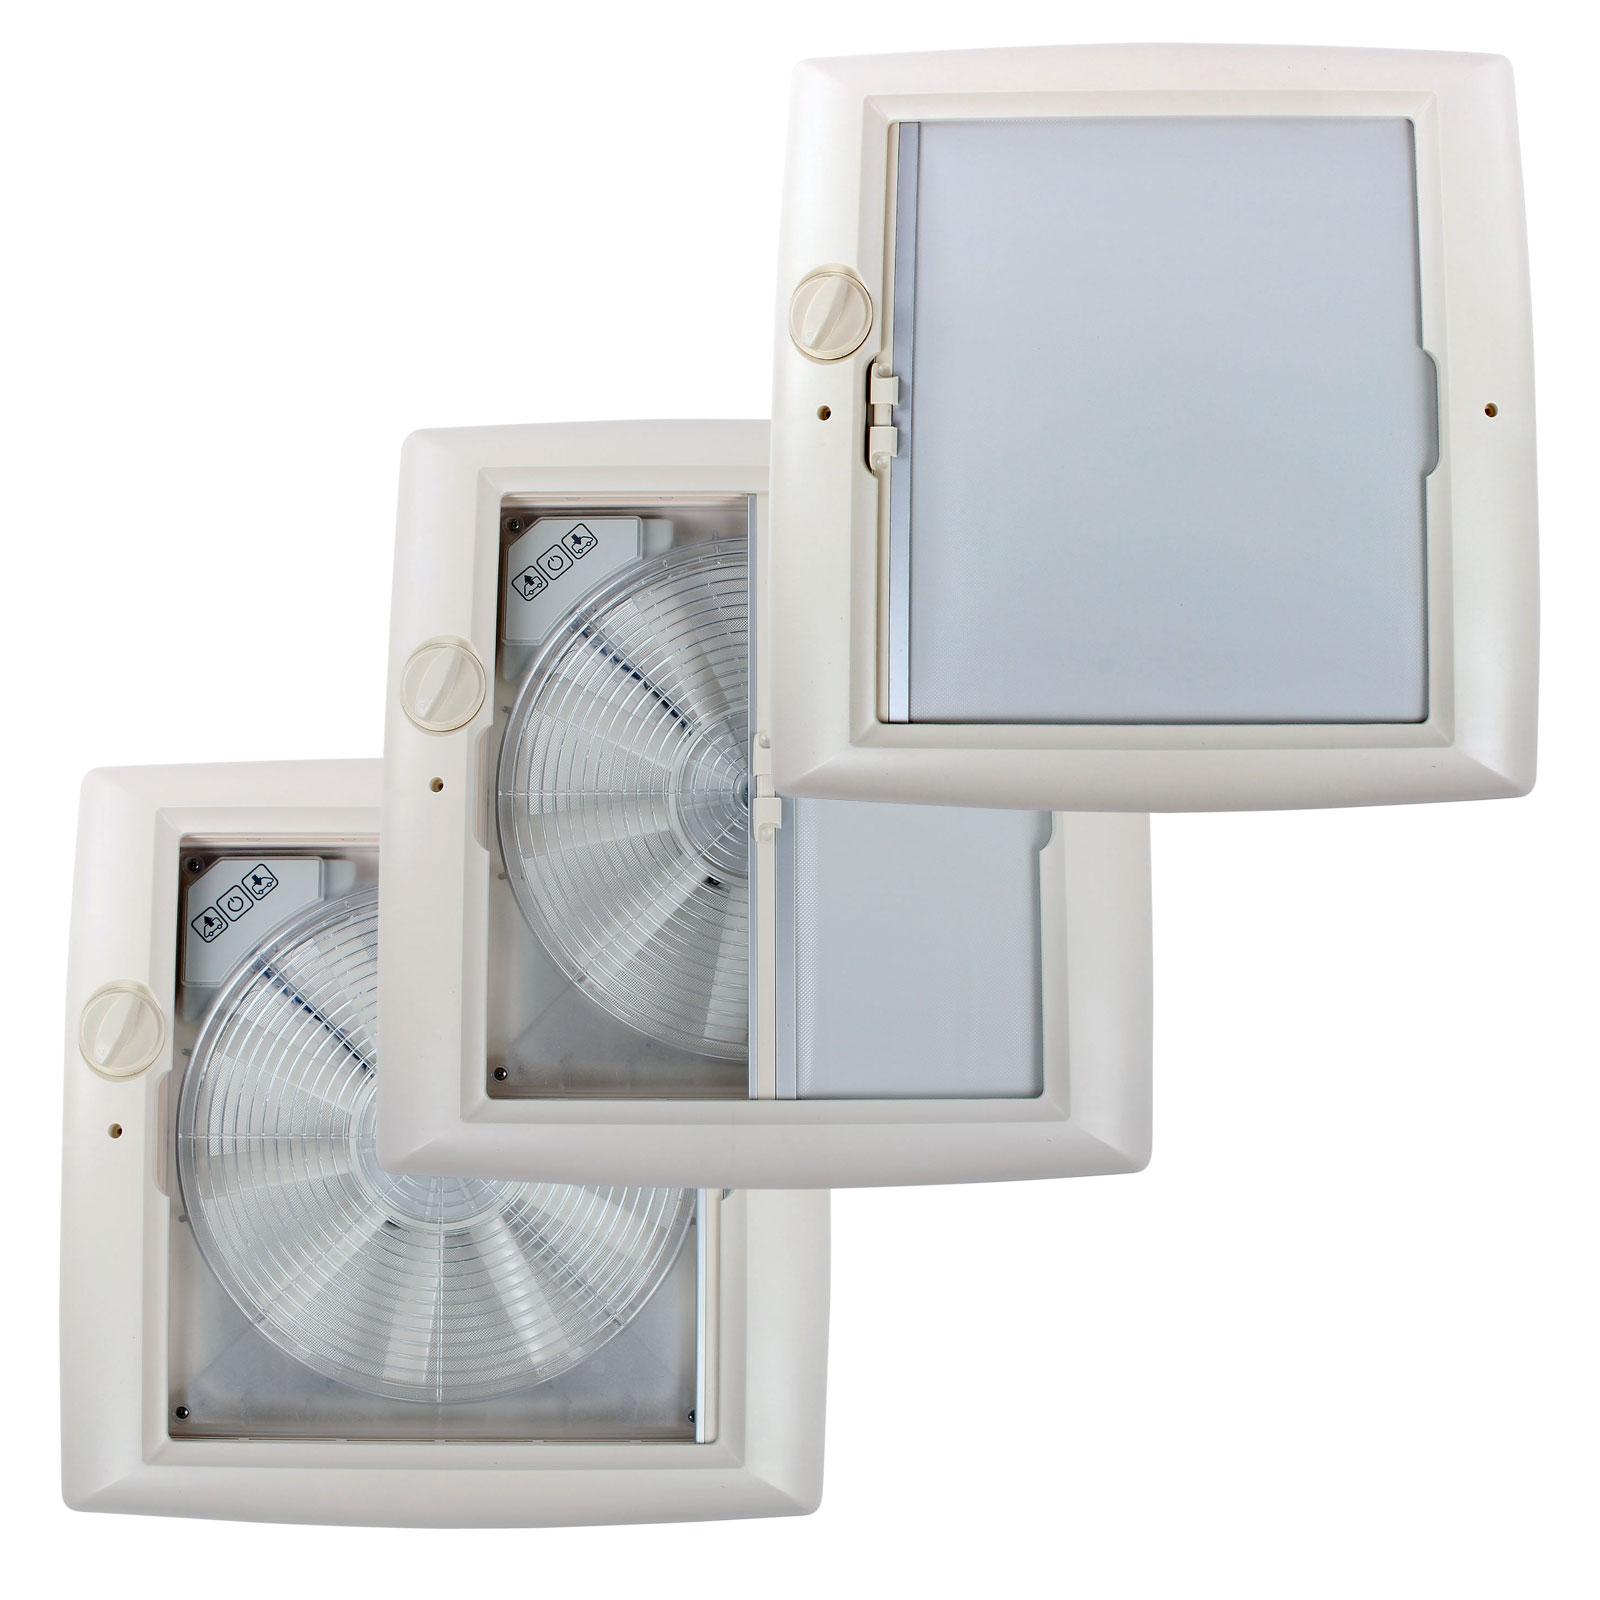 thule kurbeldachhaube omni vent transparent 40x40 12 volt. Black Bedroom Furniture Sets. Home Design Ideas